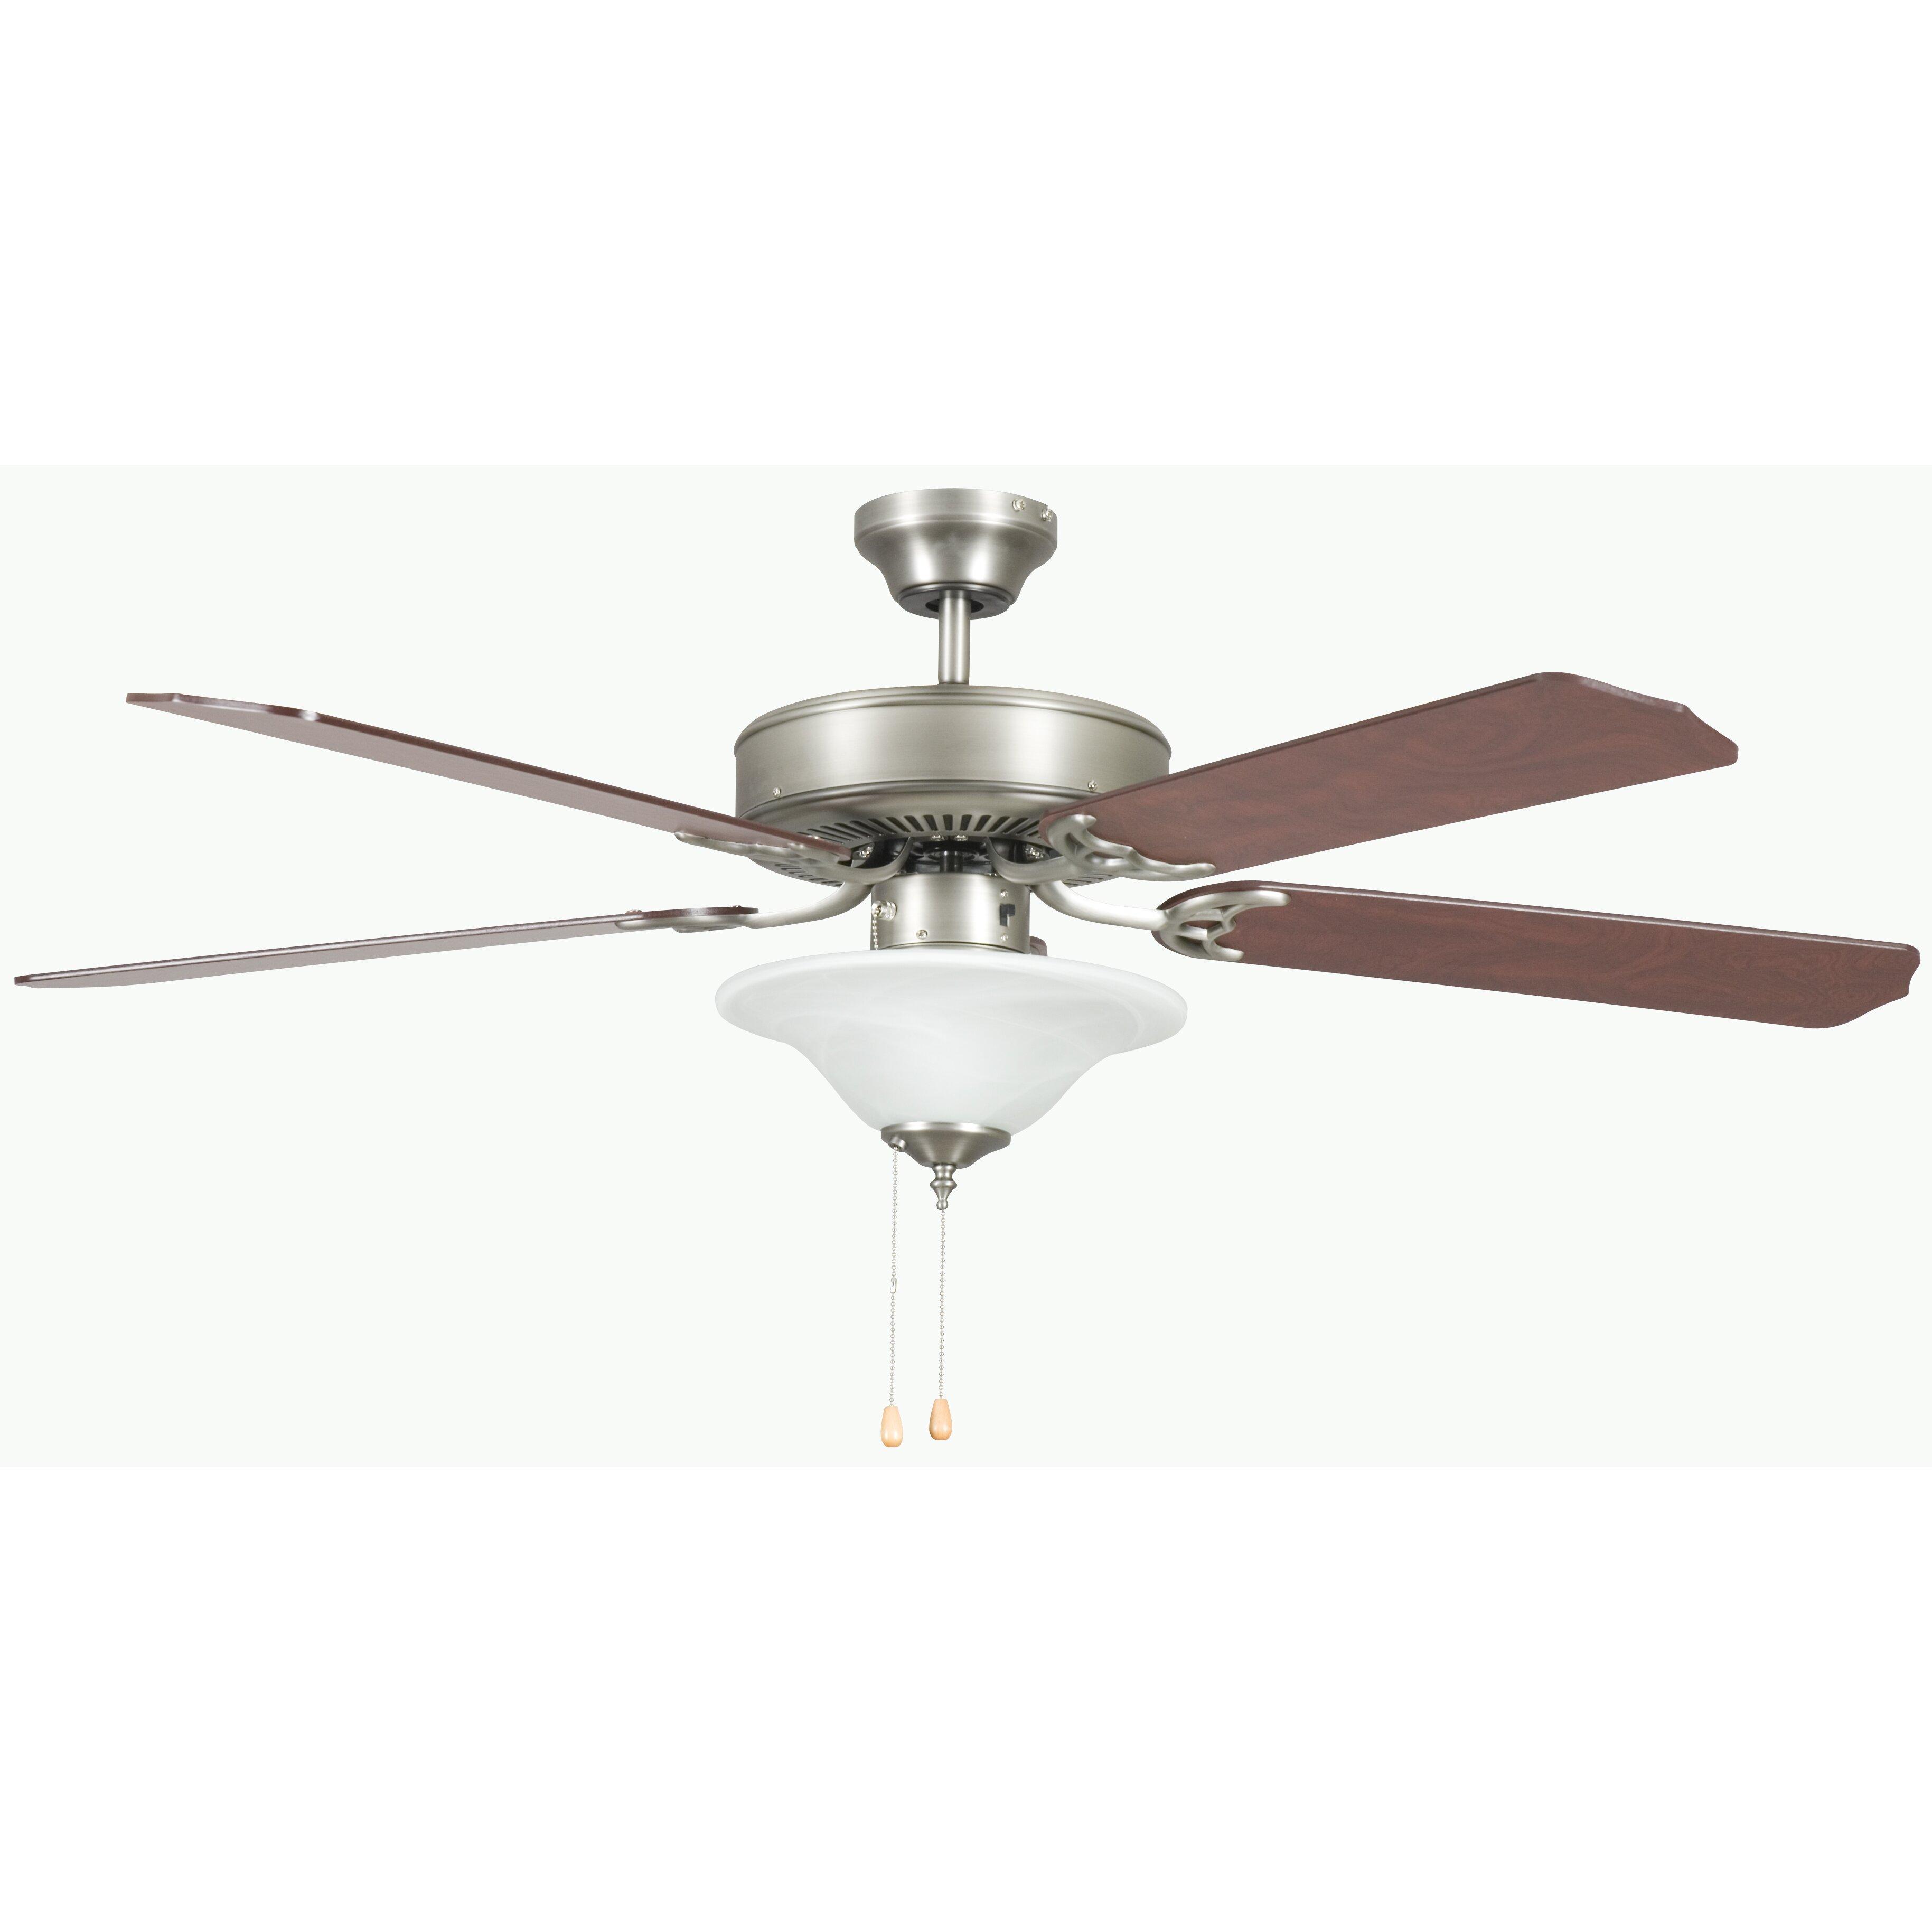 Concord fans 52 heritage 5 blade ceiling fan reviews wayfair - Ceiling fan short blades ...